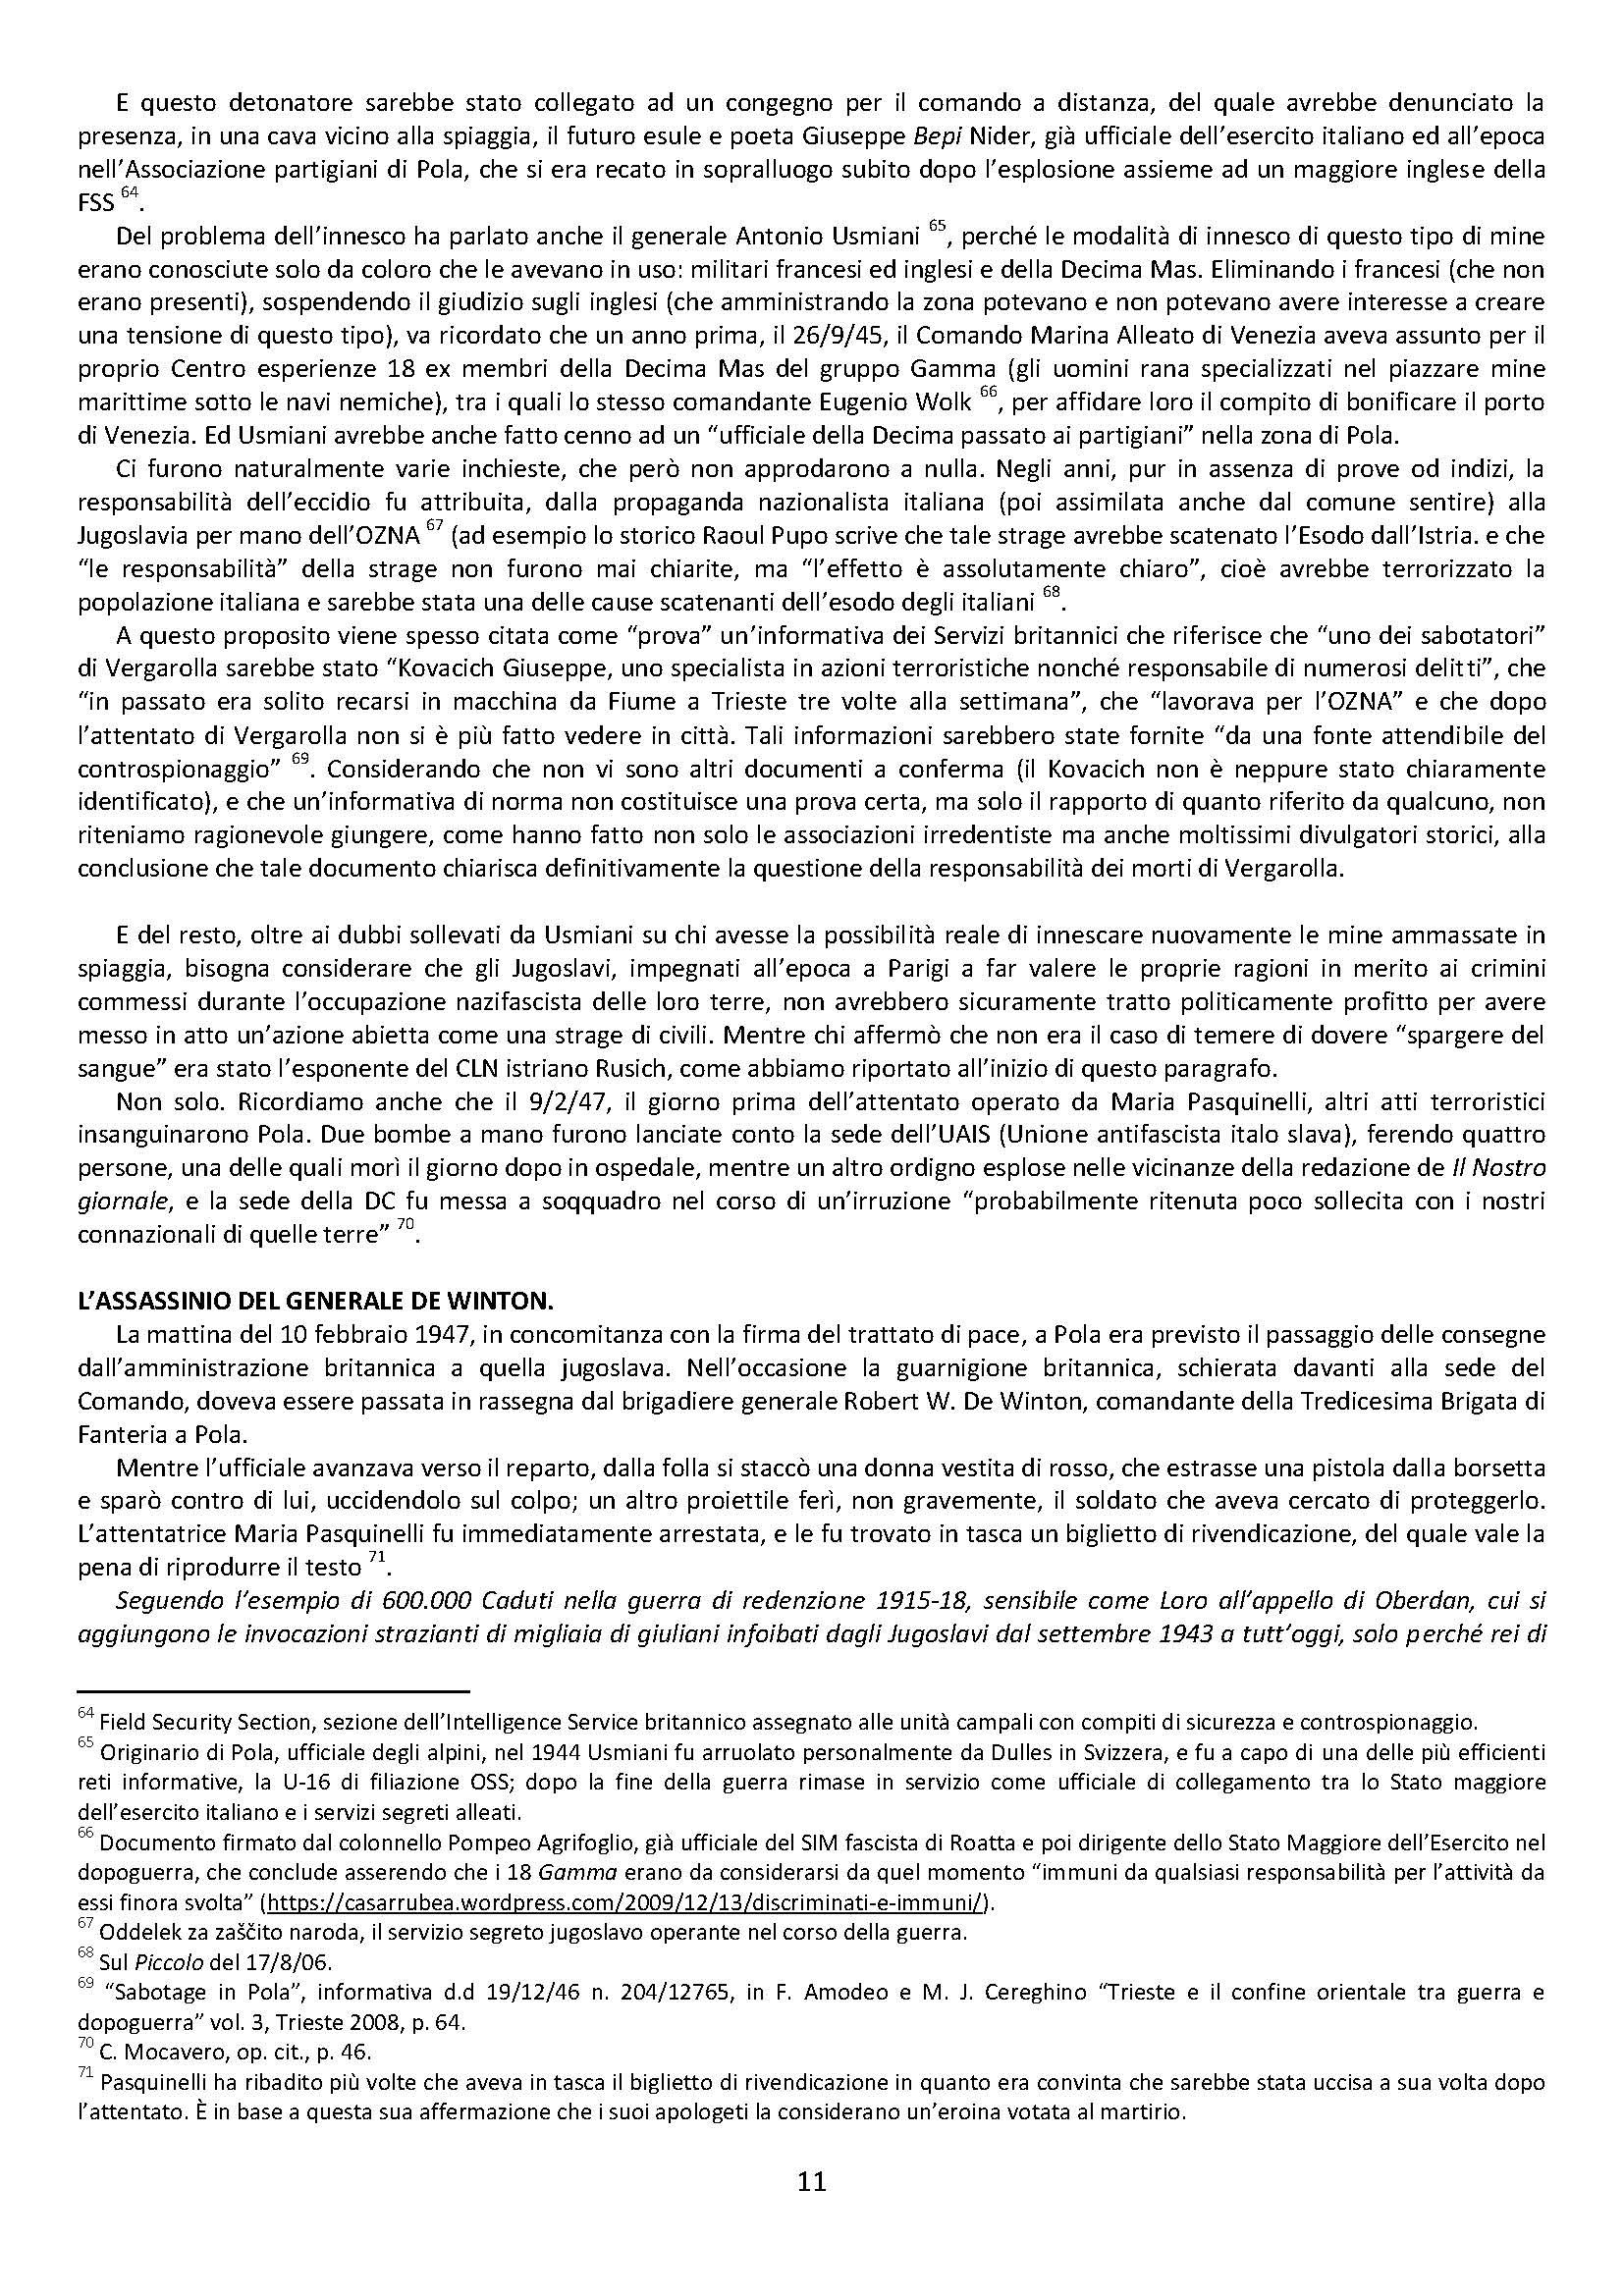 dossier-maria-pasquinelli_Page_11